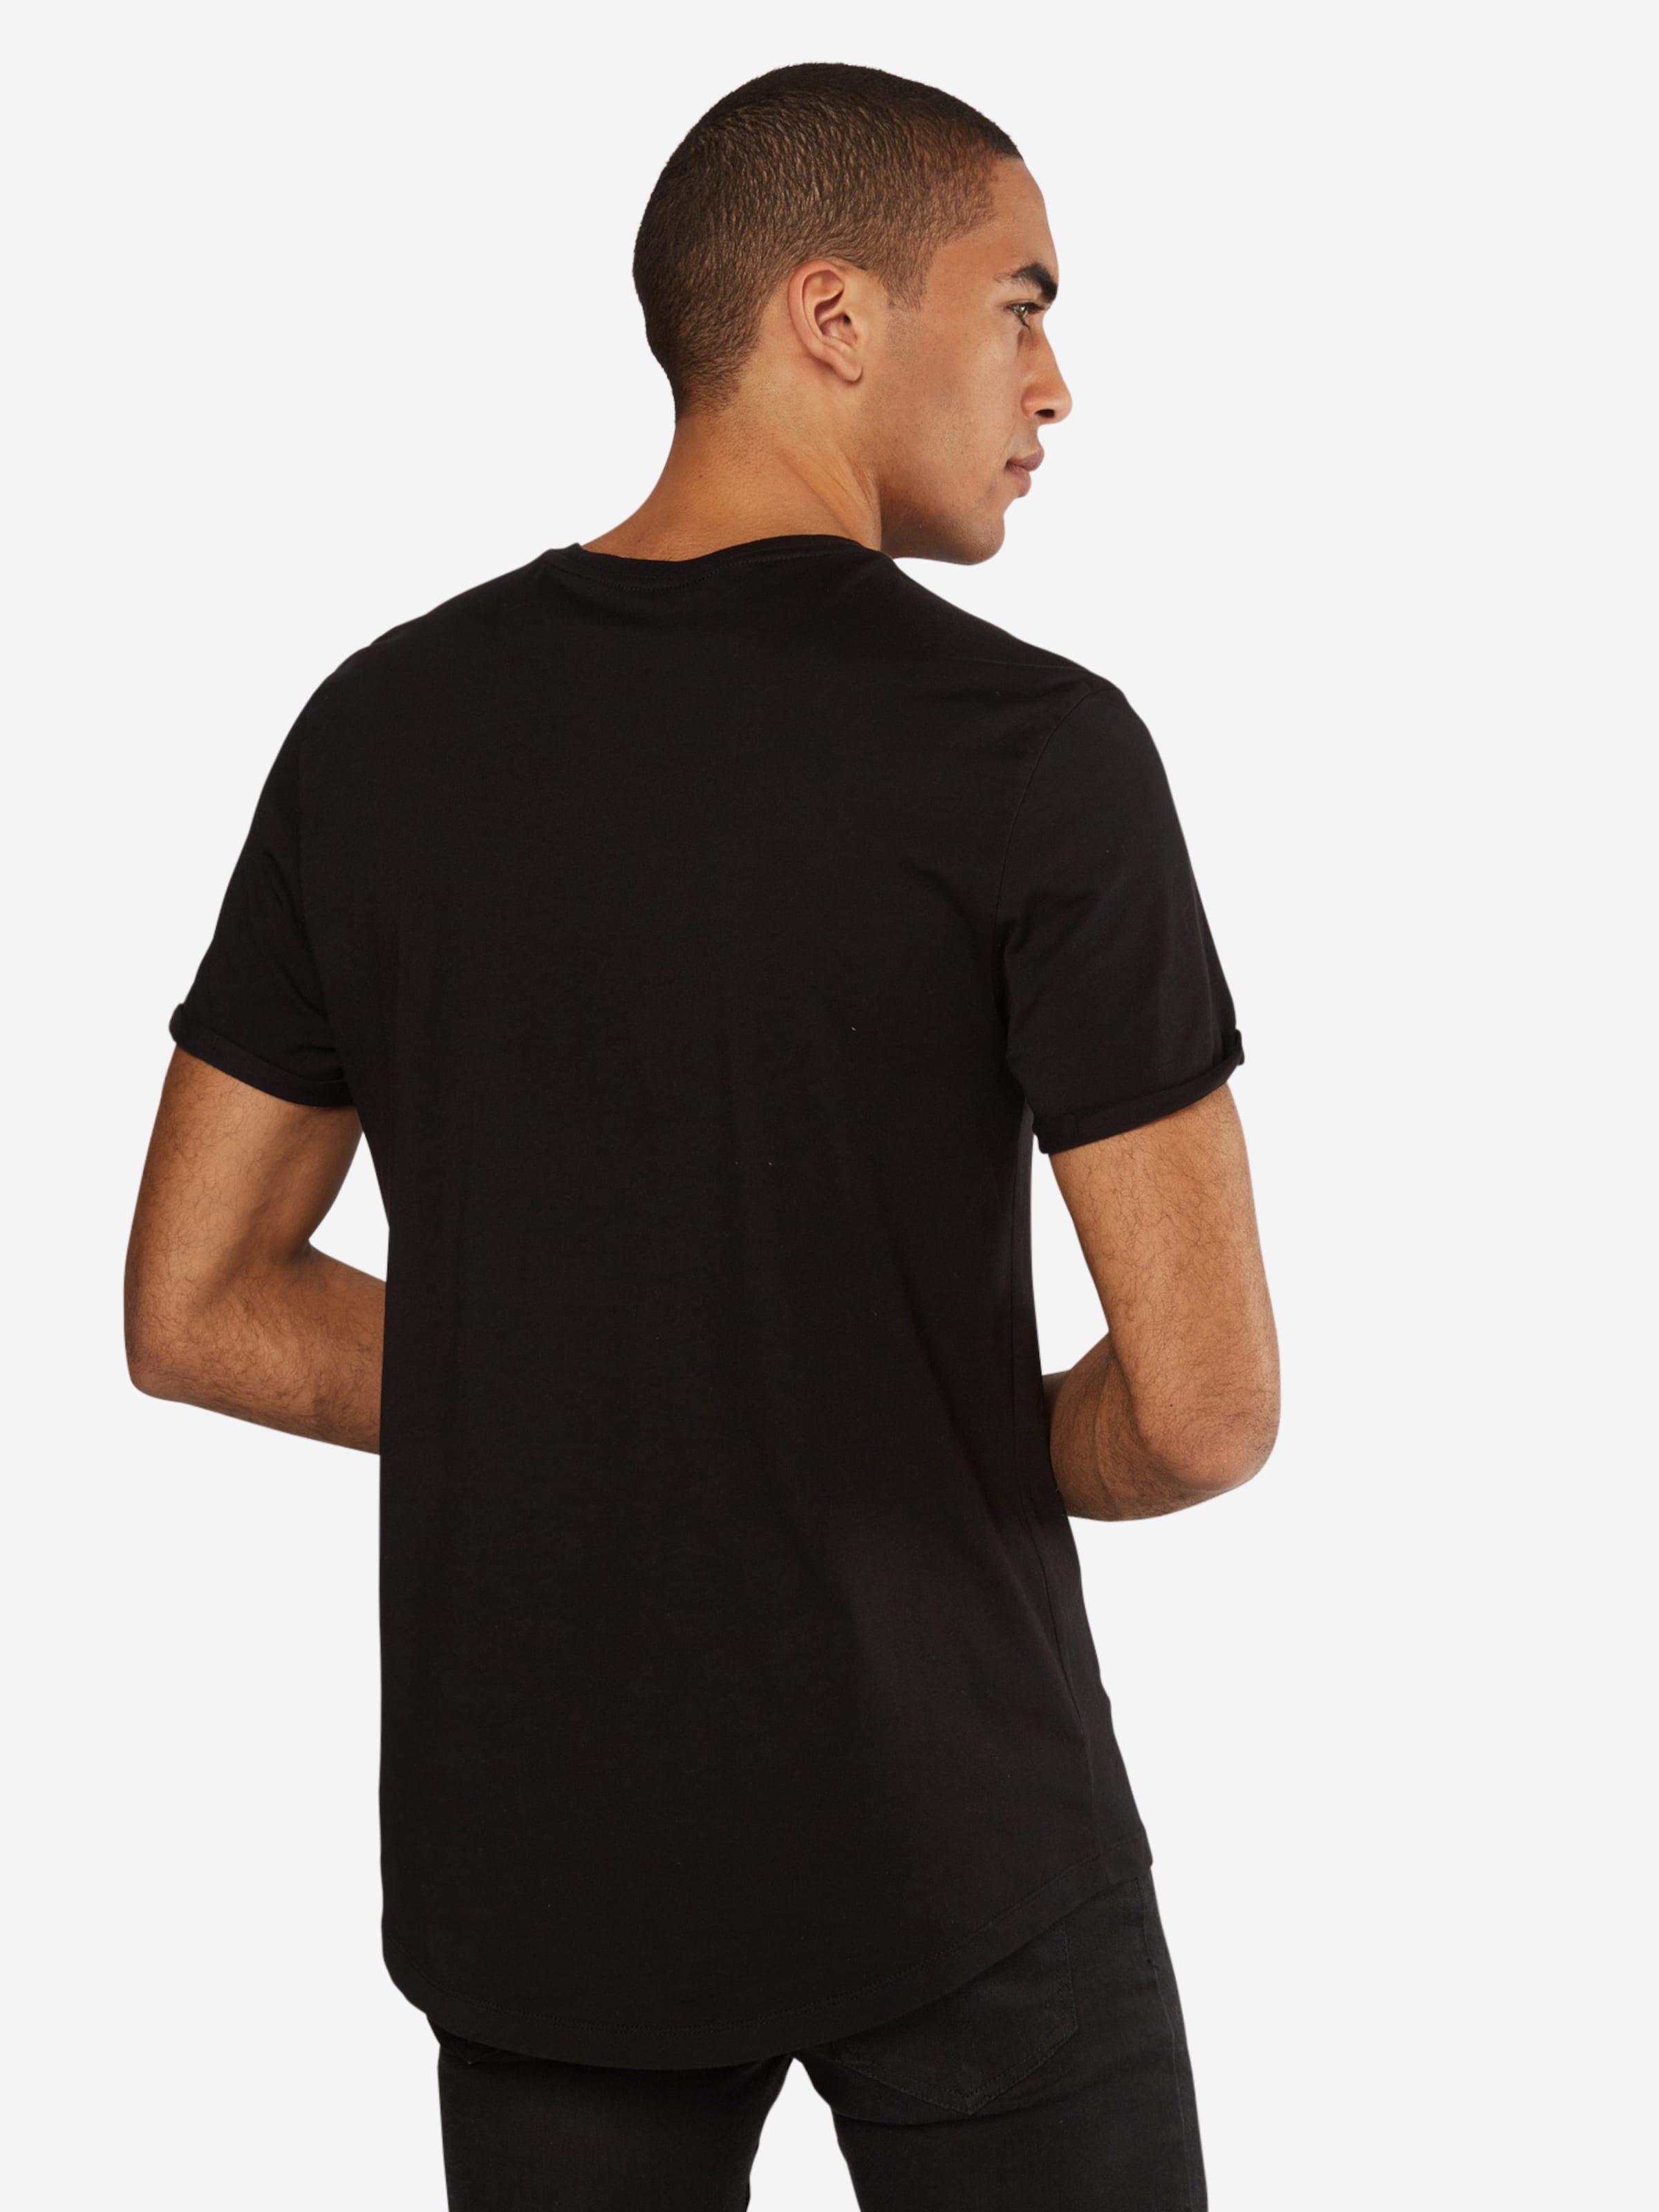 Pepe Pepe Shirt T T Jeans Shirt Jeans Pepe 'Leo' 'Leo' pwqW7ES